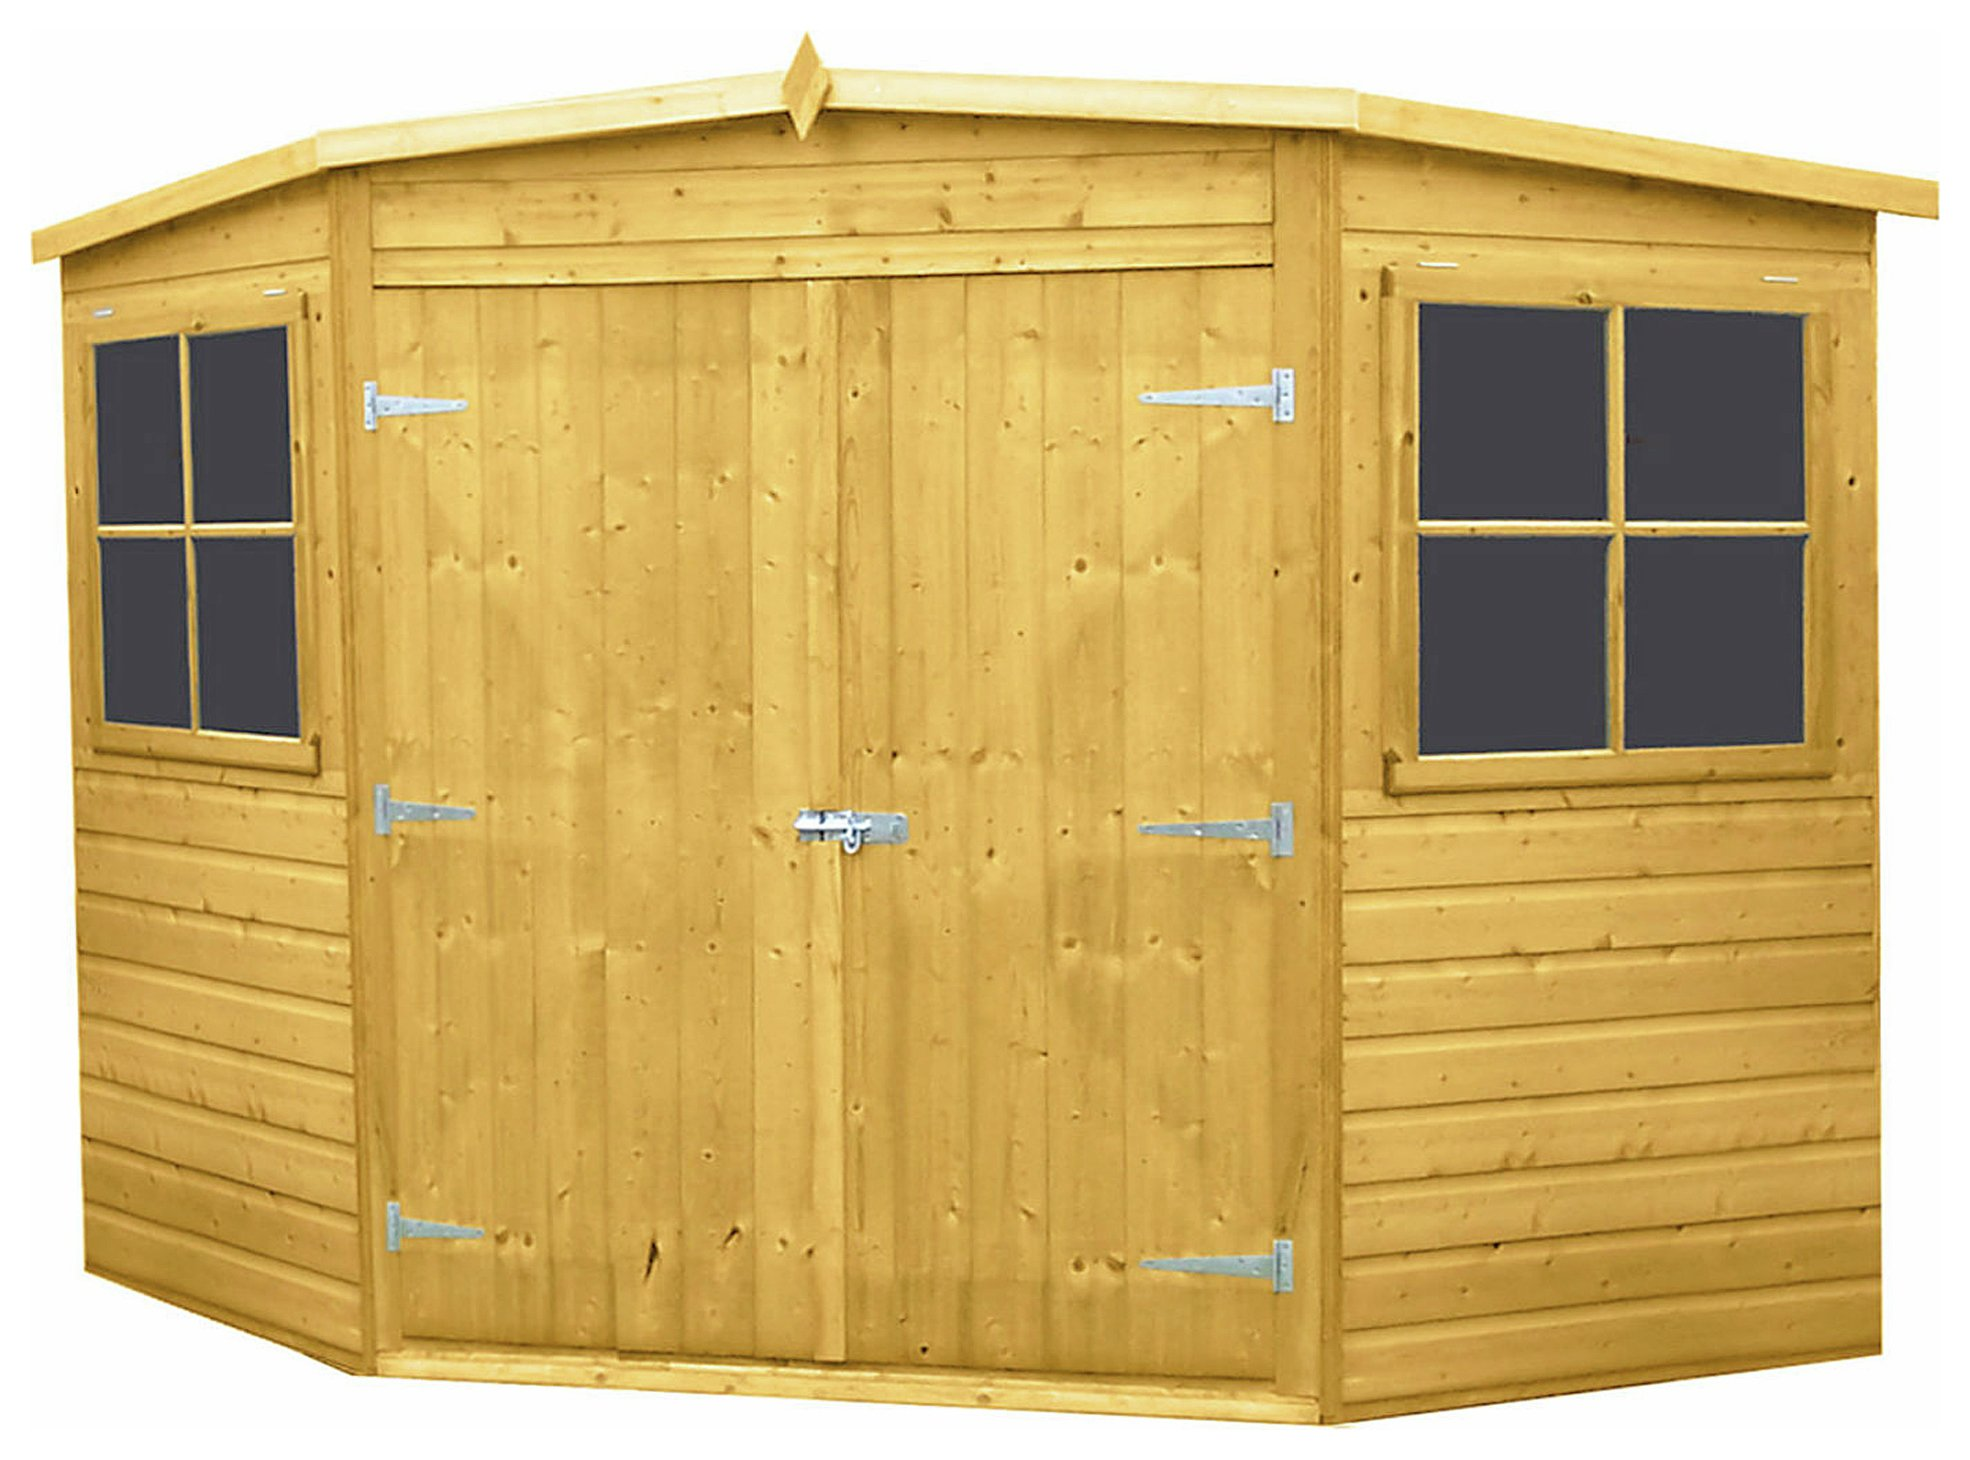 Garden Sheds Argos buy homewood shiplap wooden corner shed - 8 x 8ft at argos.co.uk